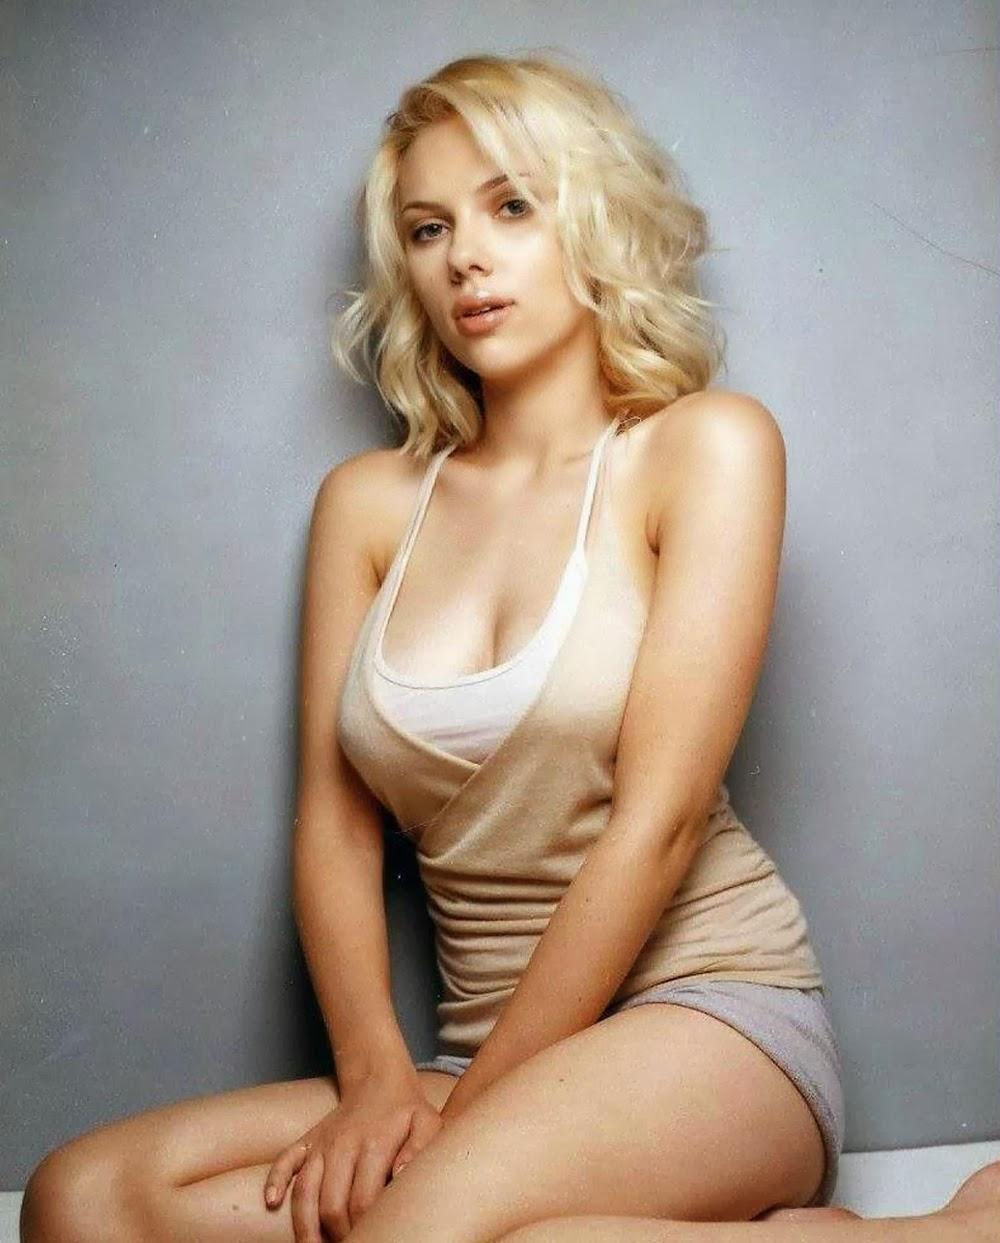 Hollywood Sexy Girl : Scarlett Johansson - 888 Hollywood Girl